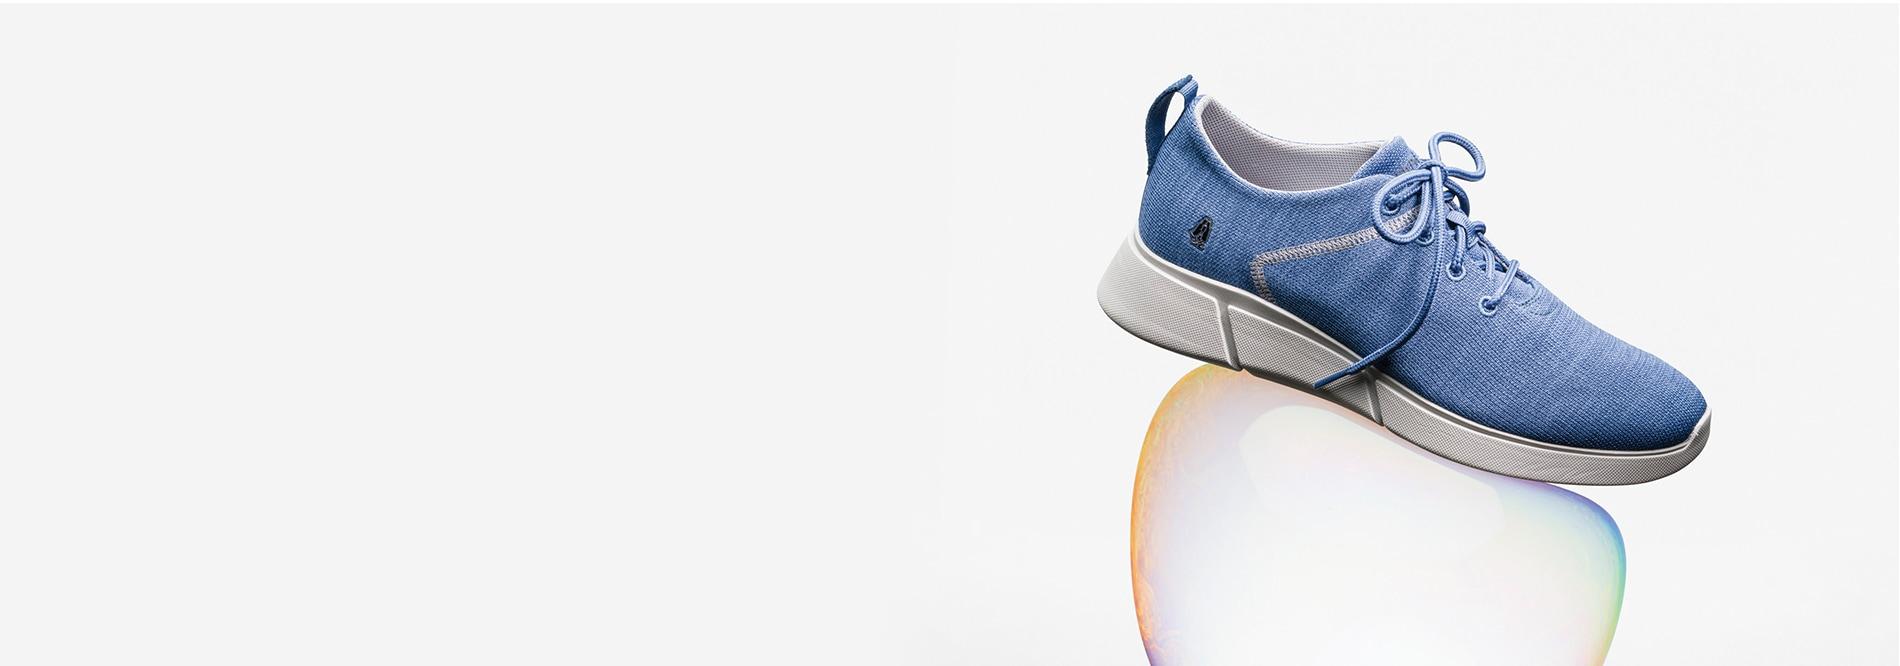 A blue Hush Puppies body shoe on a bubble